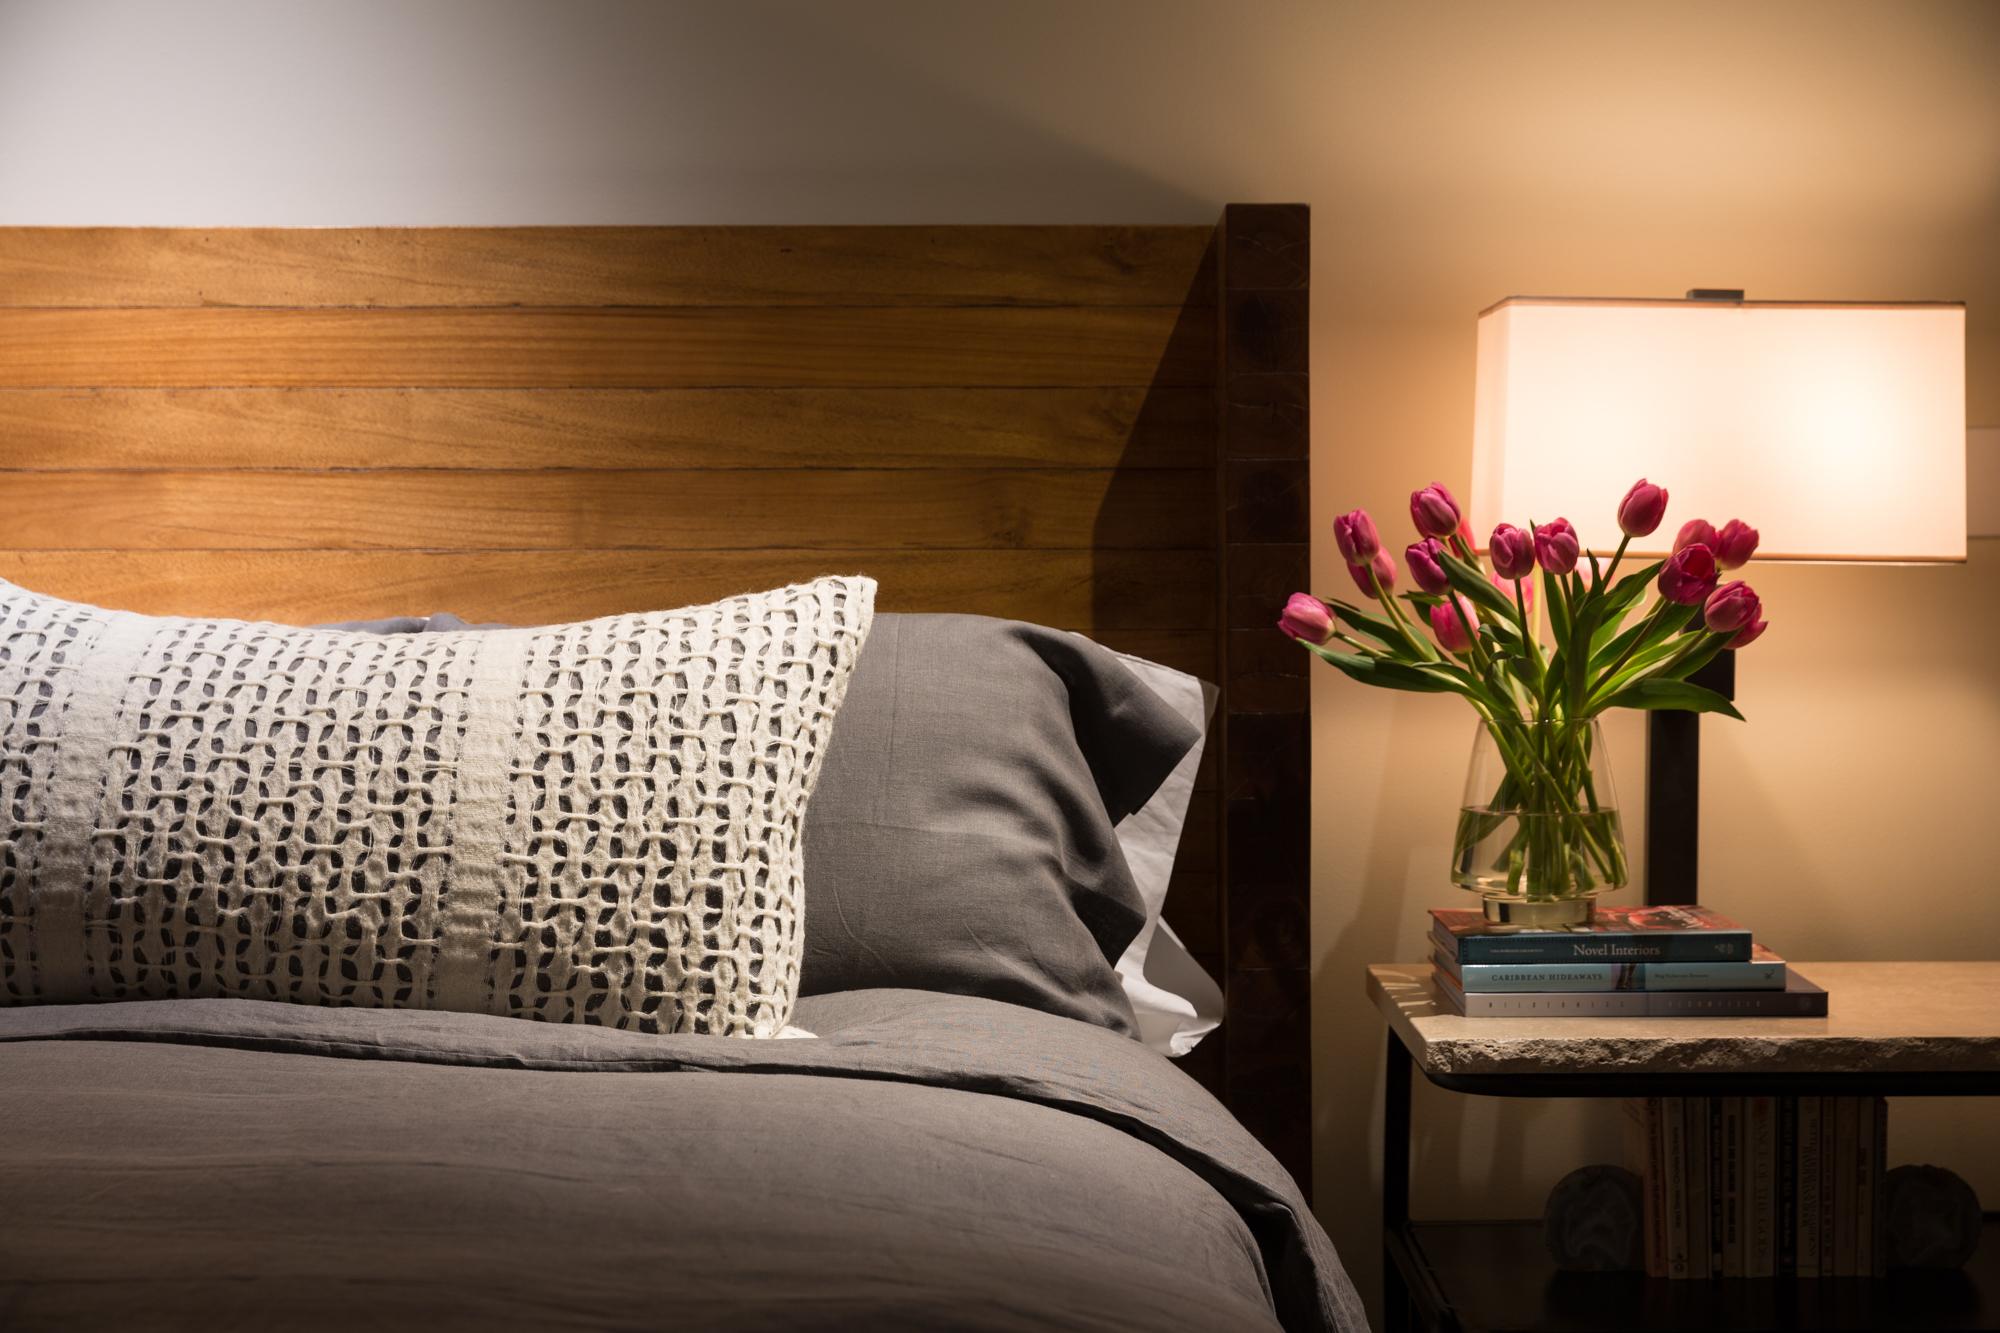 Aspen interior design, decoration, home improvement